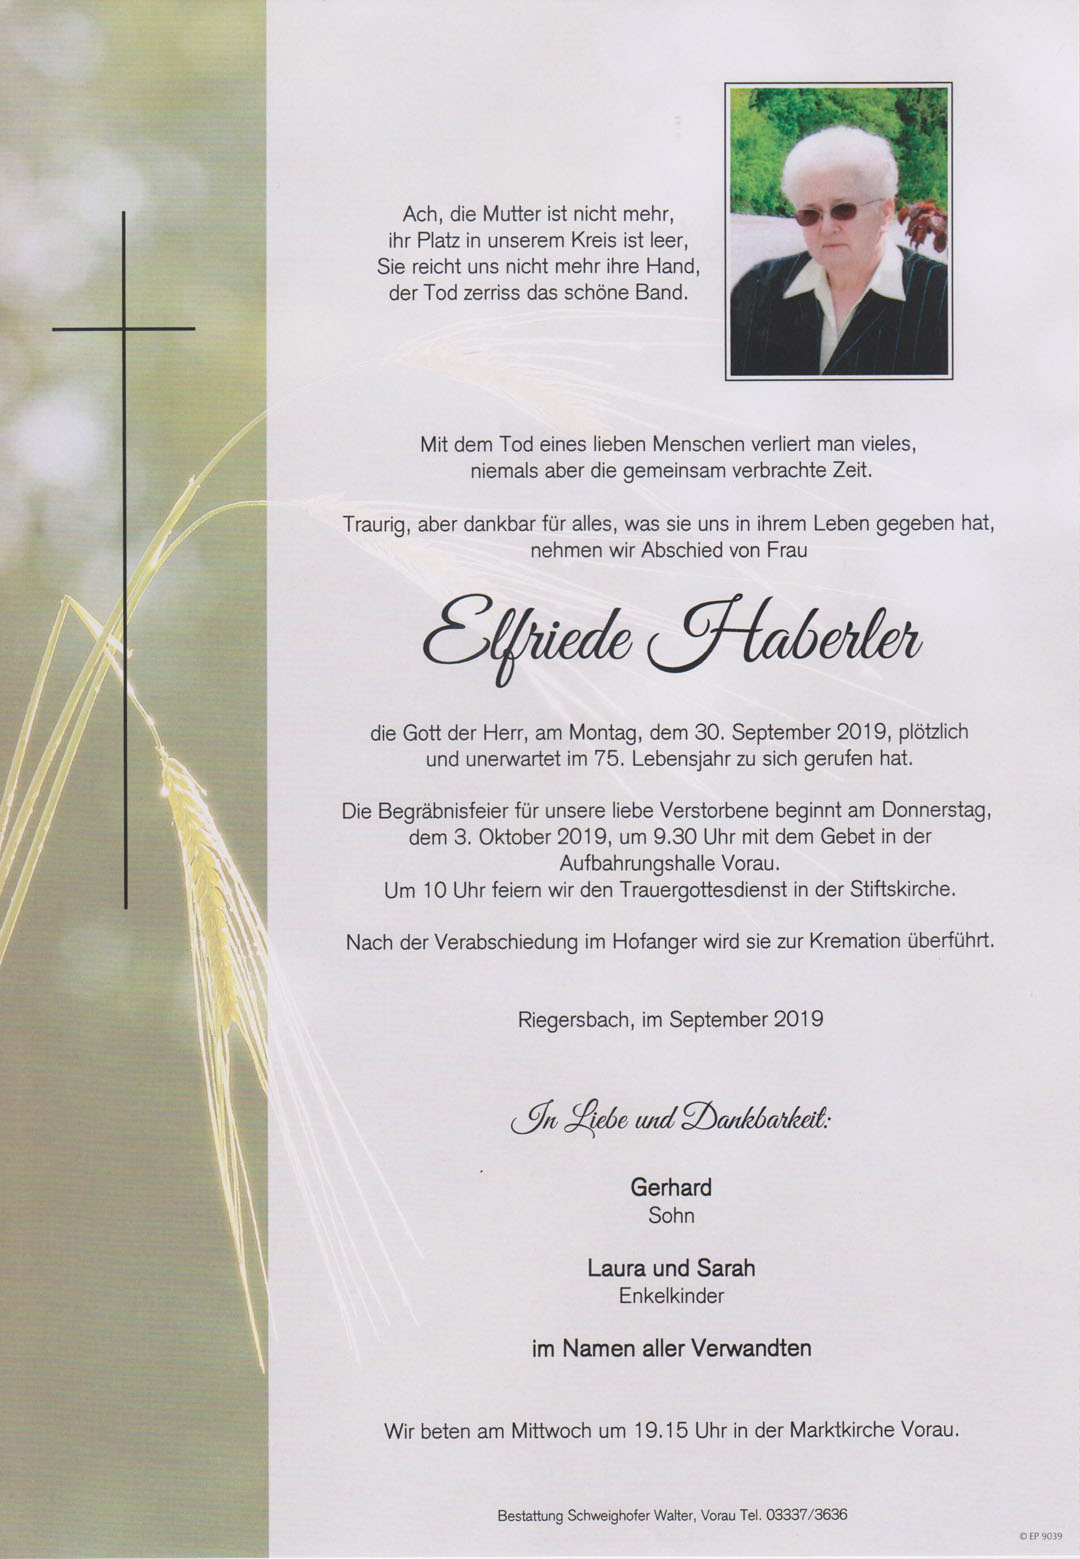 Elfriede Haberla